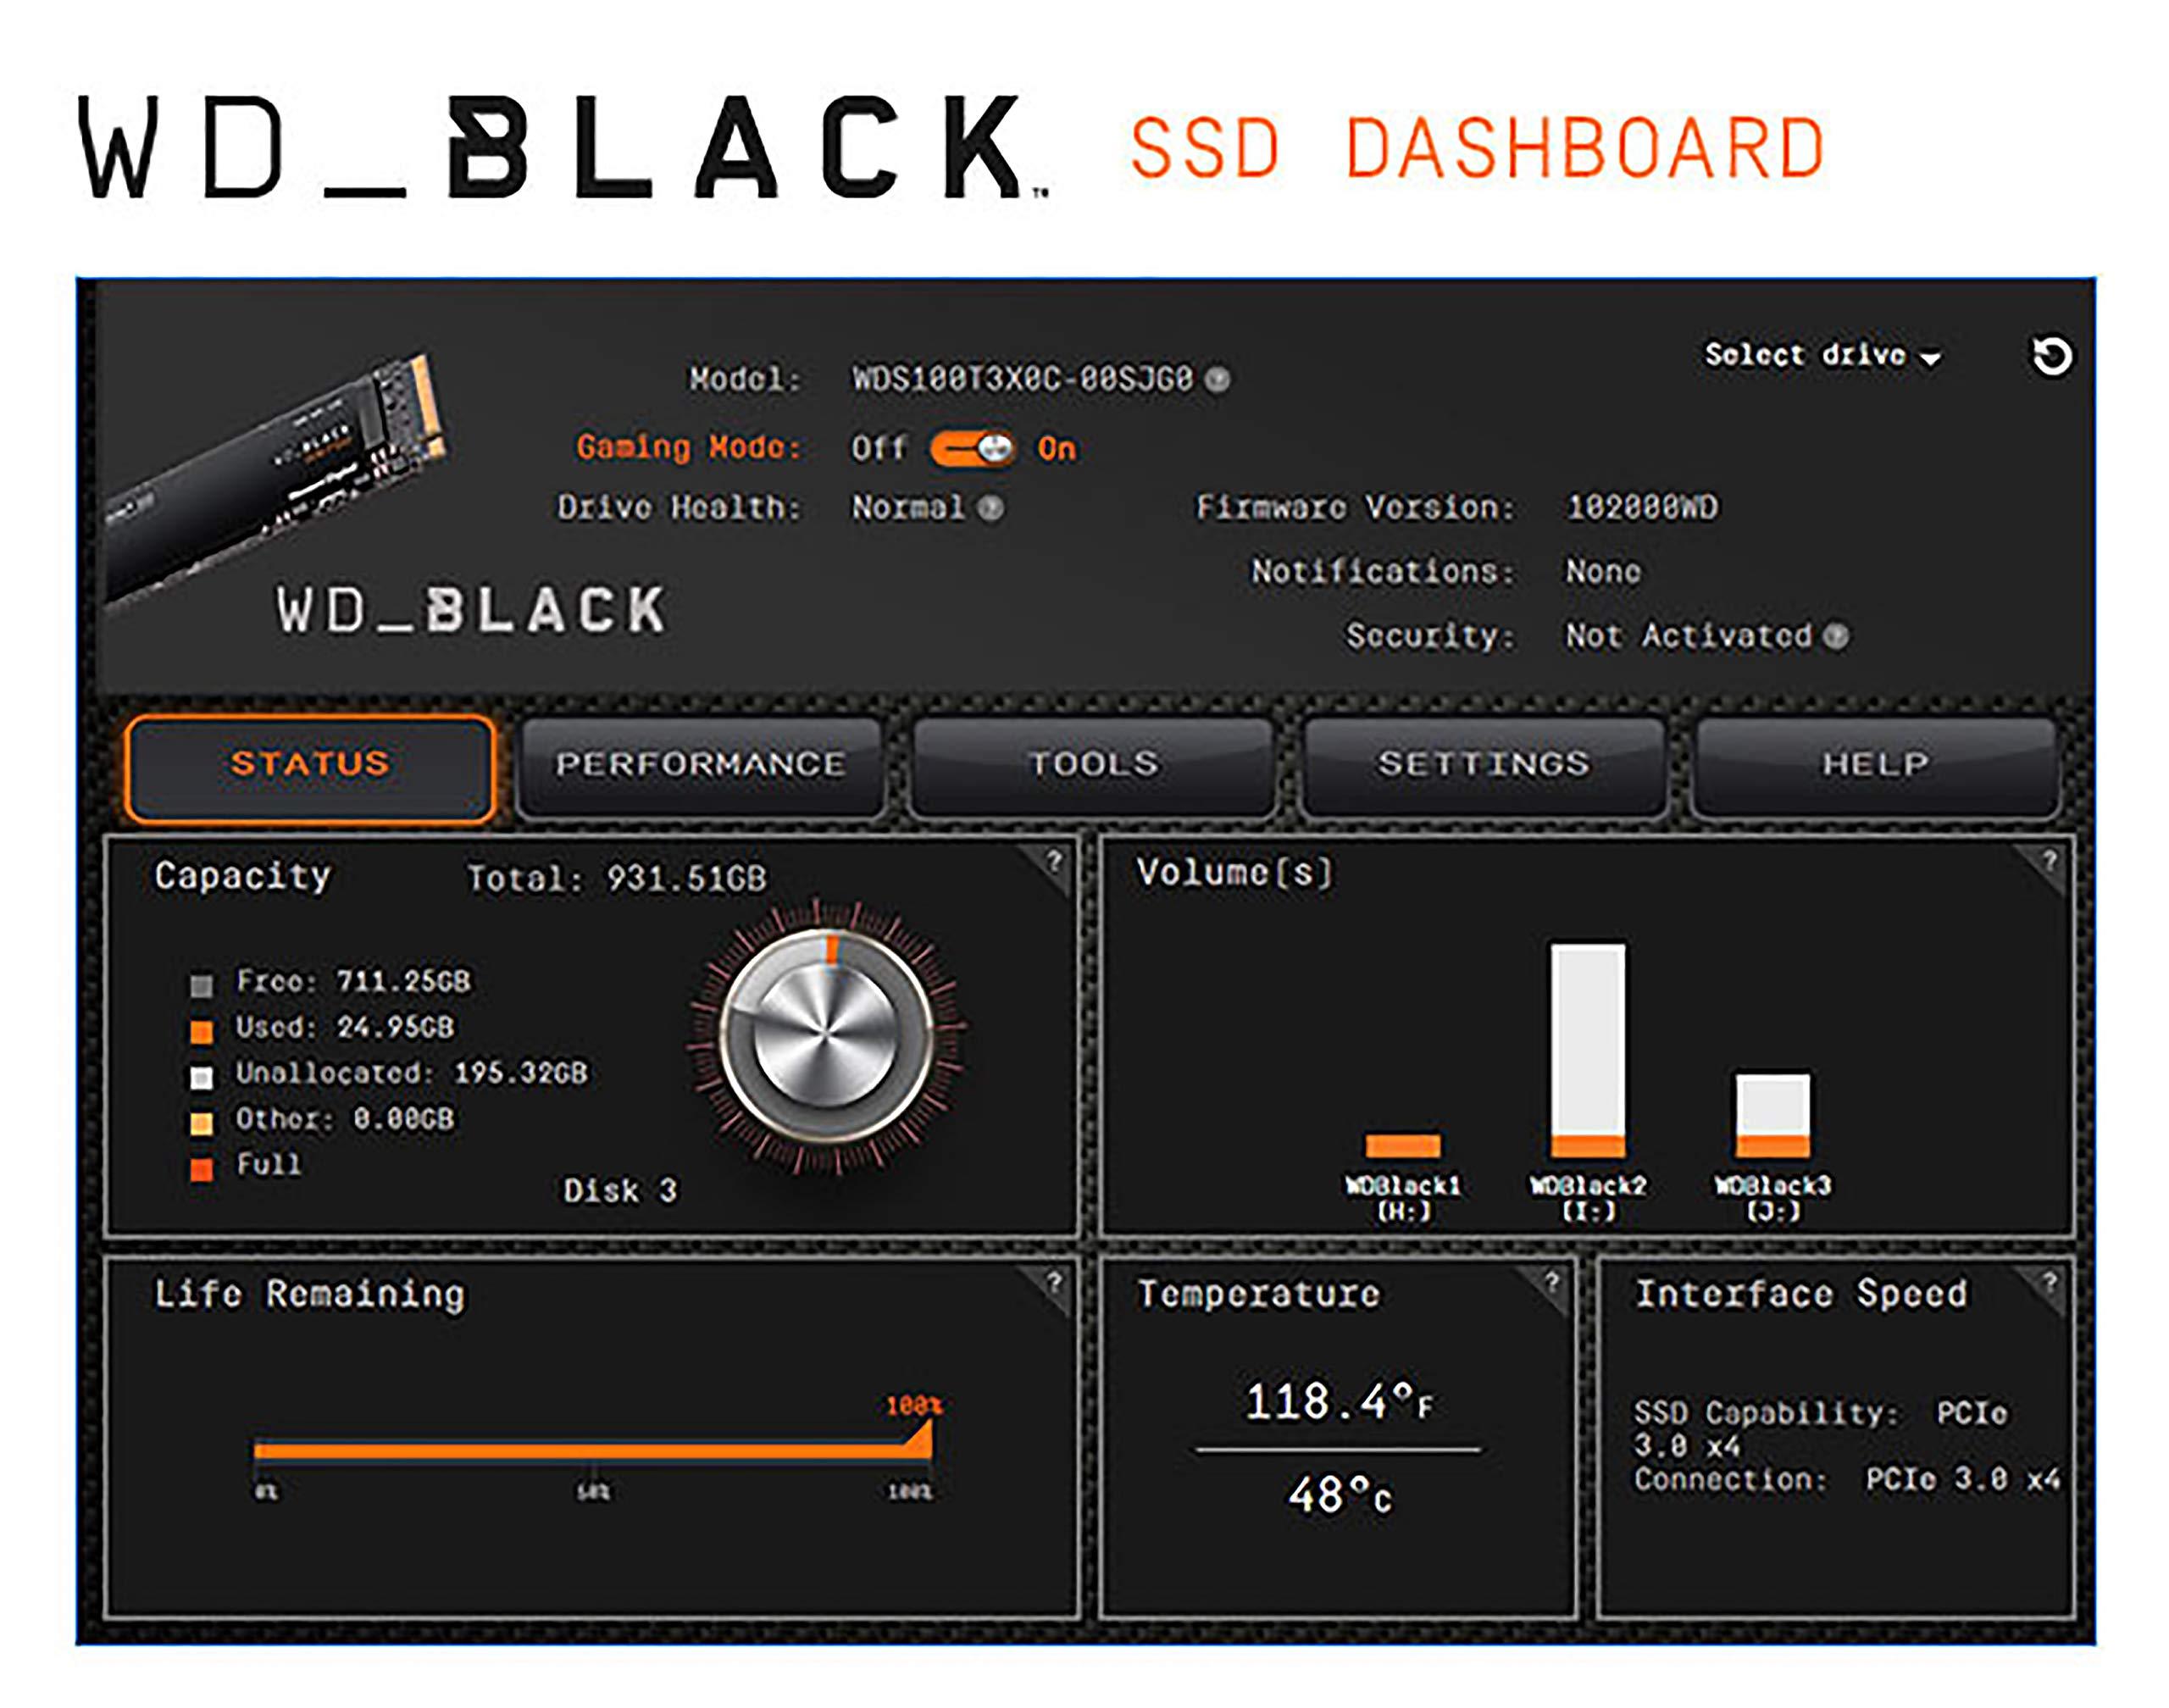 WD BLACK SN750 1TB NVMe Internal Gaming SSD - Gen3 PCIe, M.2 2280, 3D NAND - WDS100T3X0C by Western Digital (Image #6)